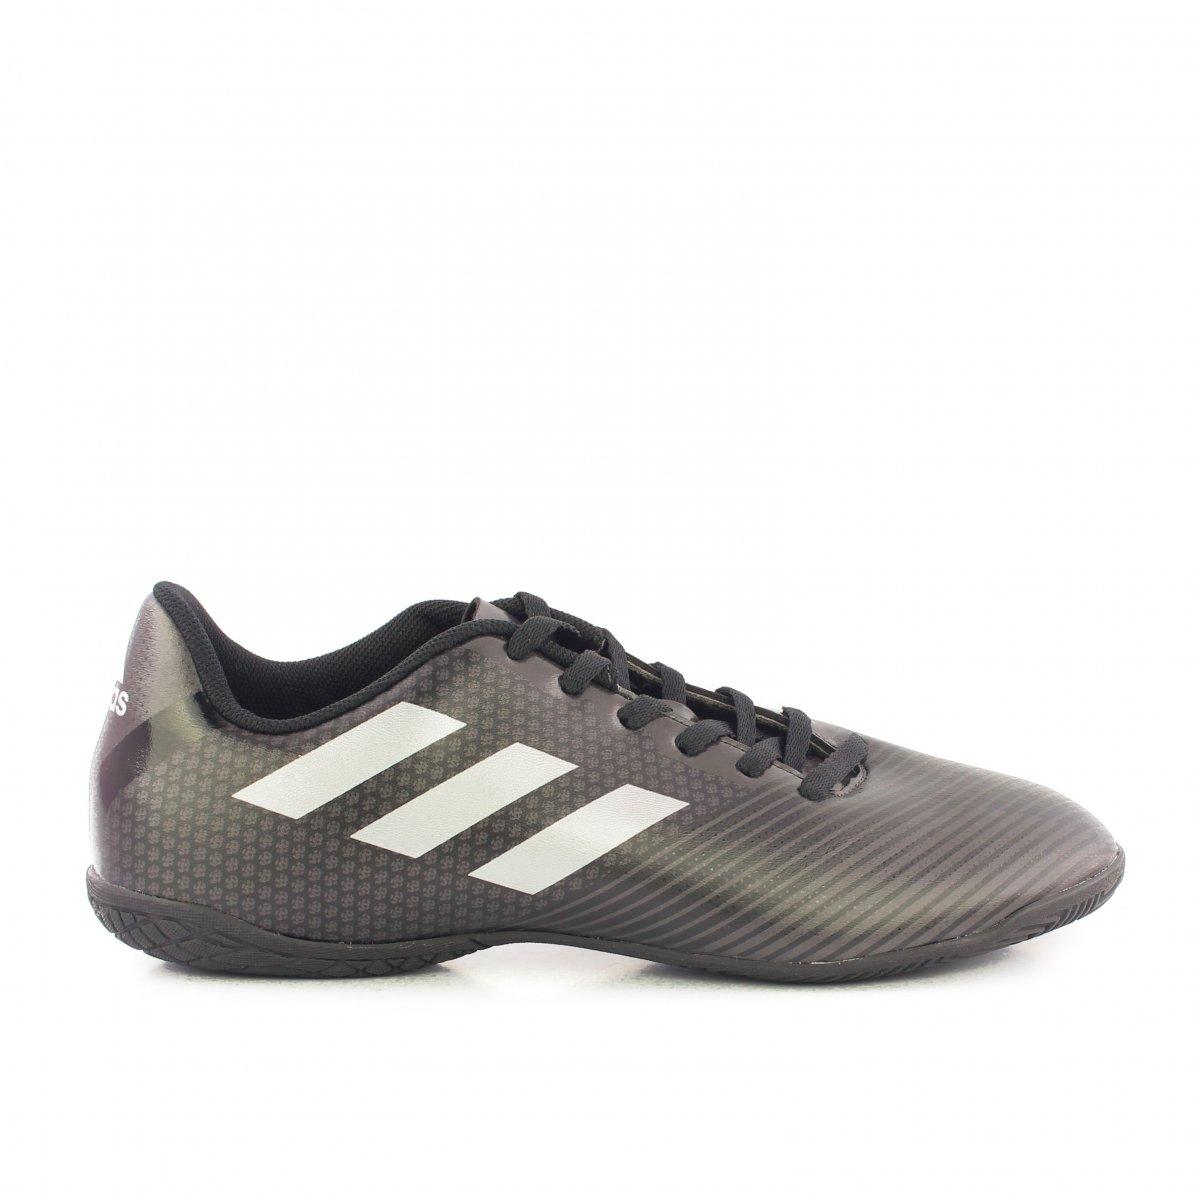 Chuteira Futsal Adidas Artilheira ii in  e6be9d0b11617